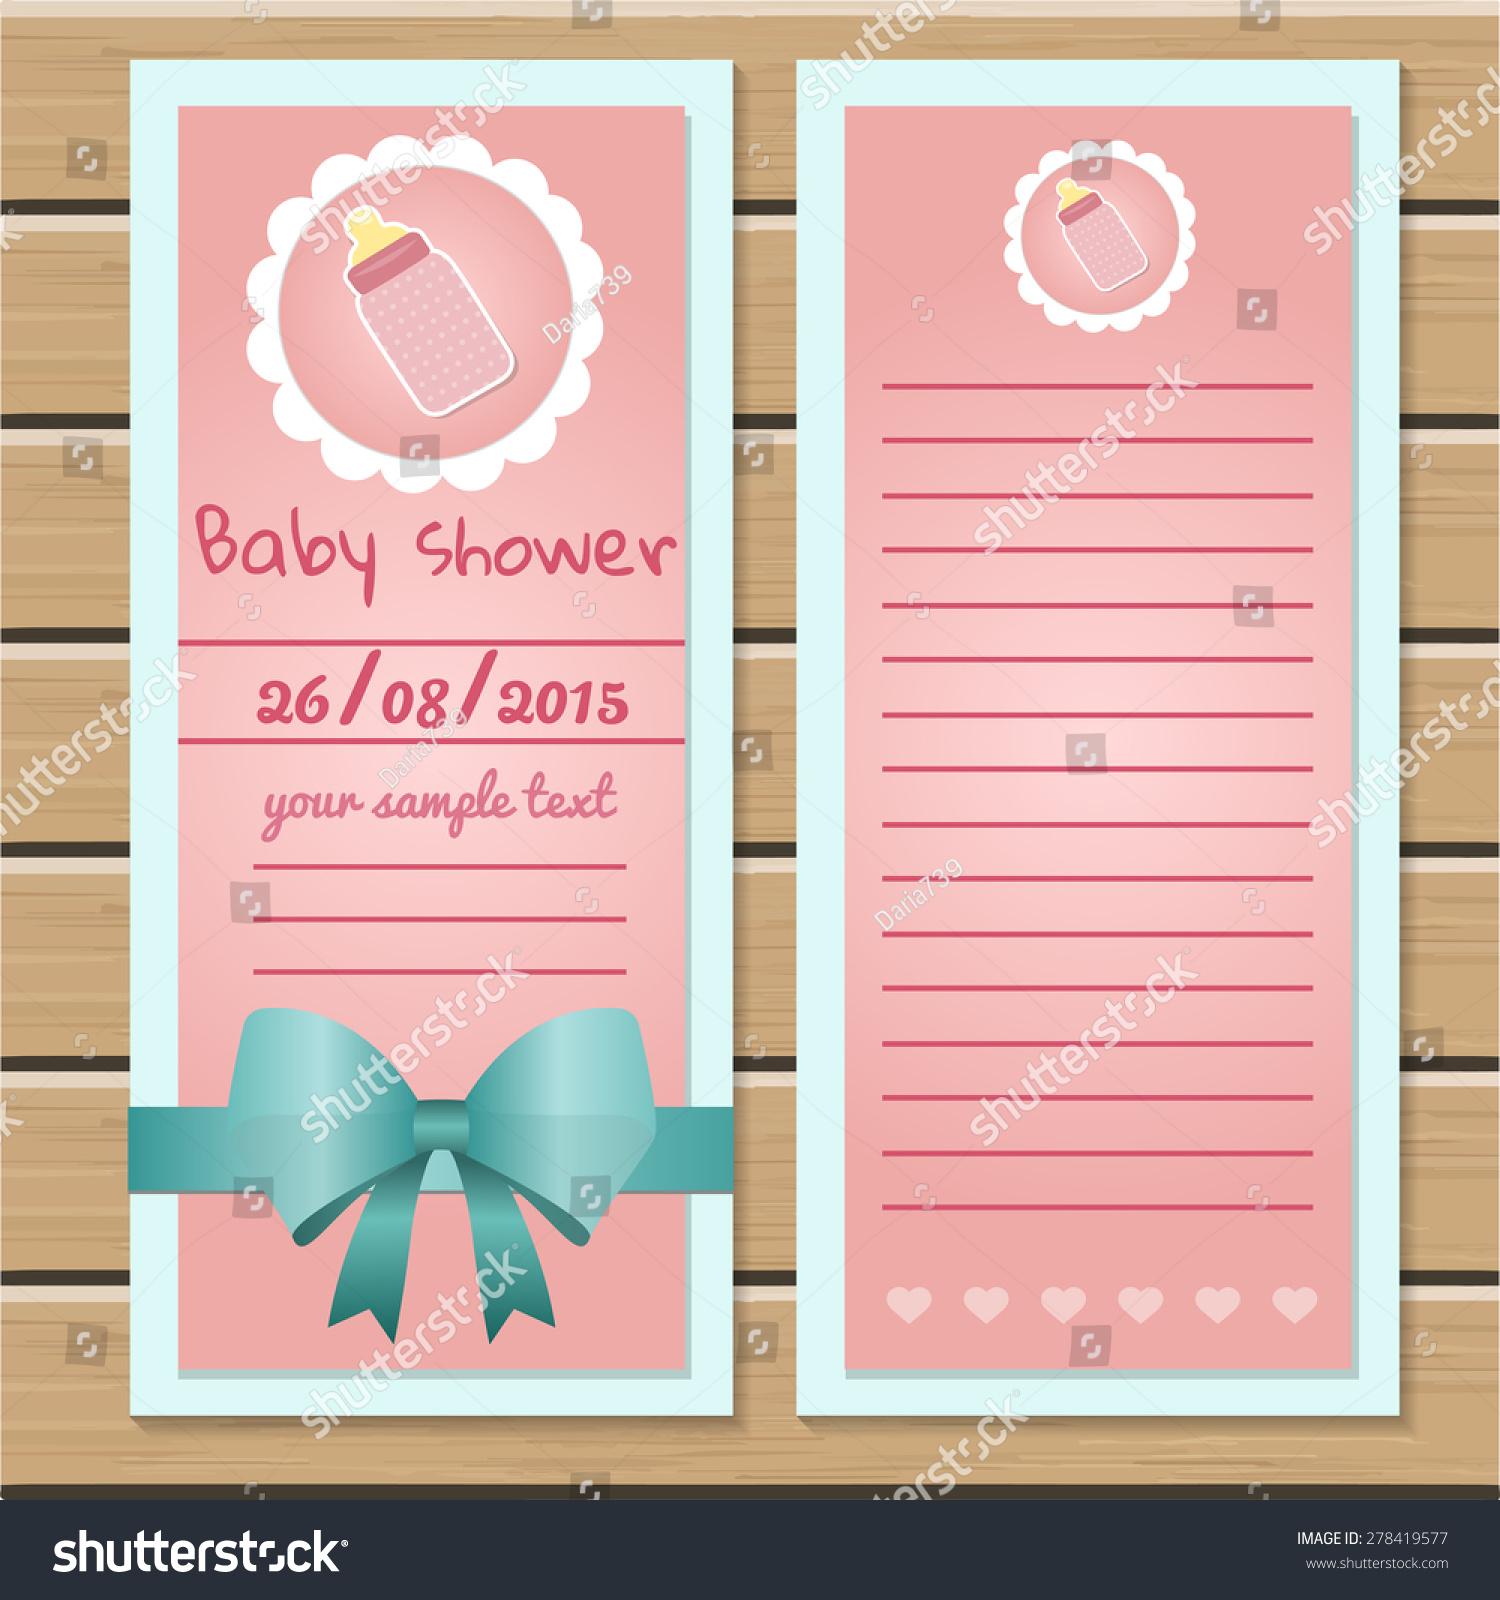 baby shower card template stock vector 278419577 shutterstock